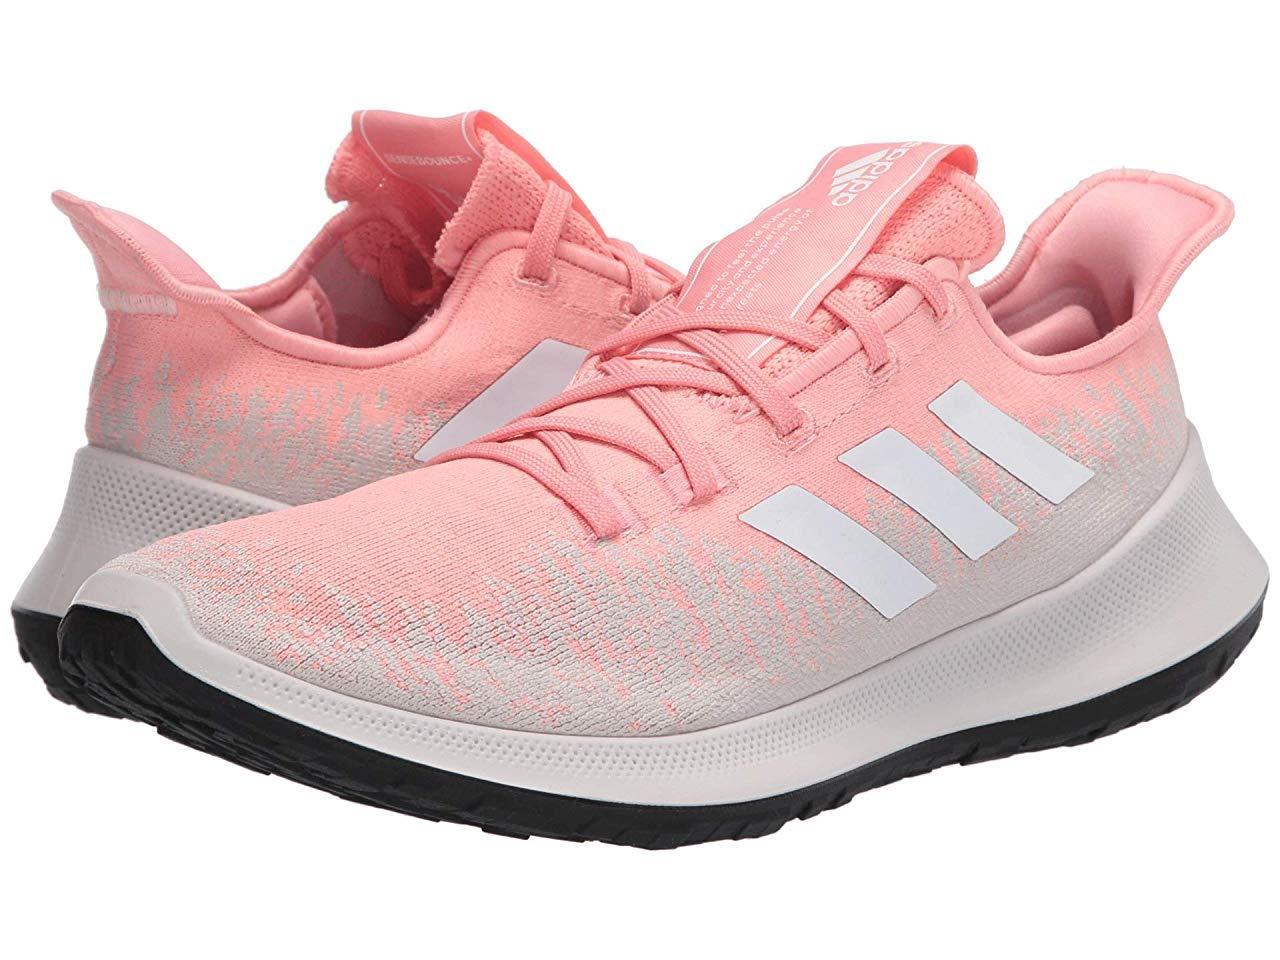 Кроссовки/Кеды adidas Running SenseBOUNCE + Glory Pink/Footwear White/Chalk Pearl